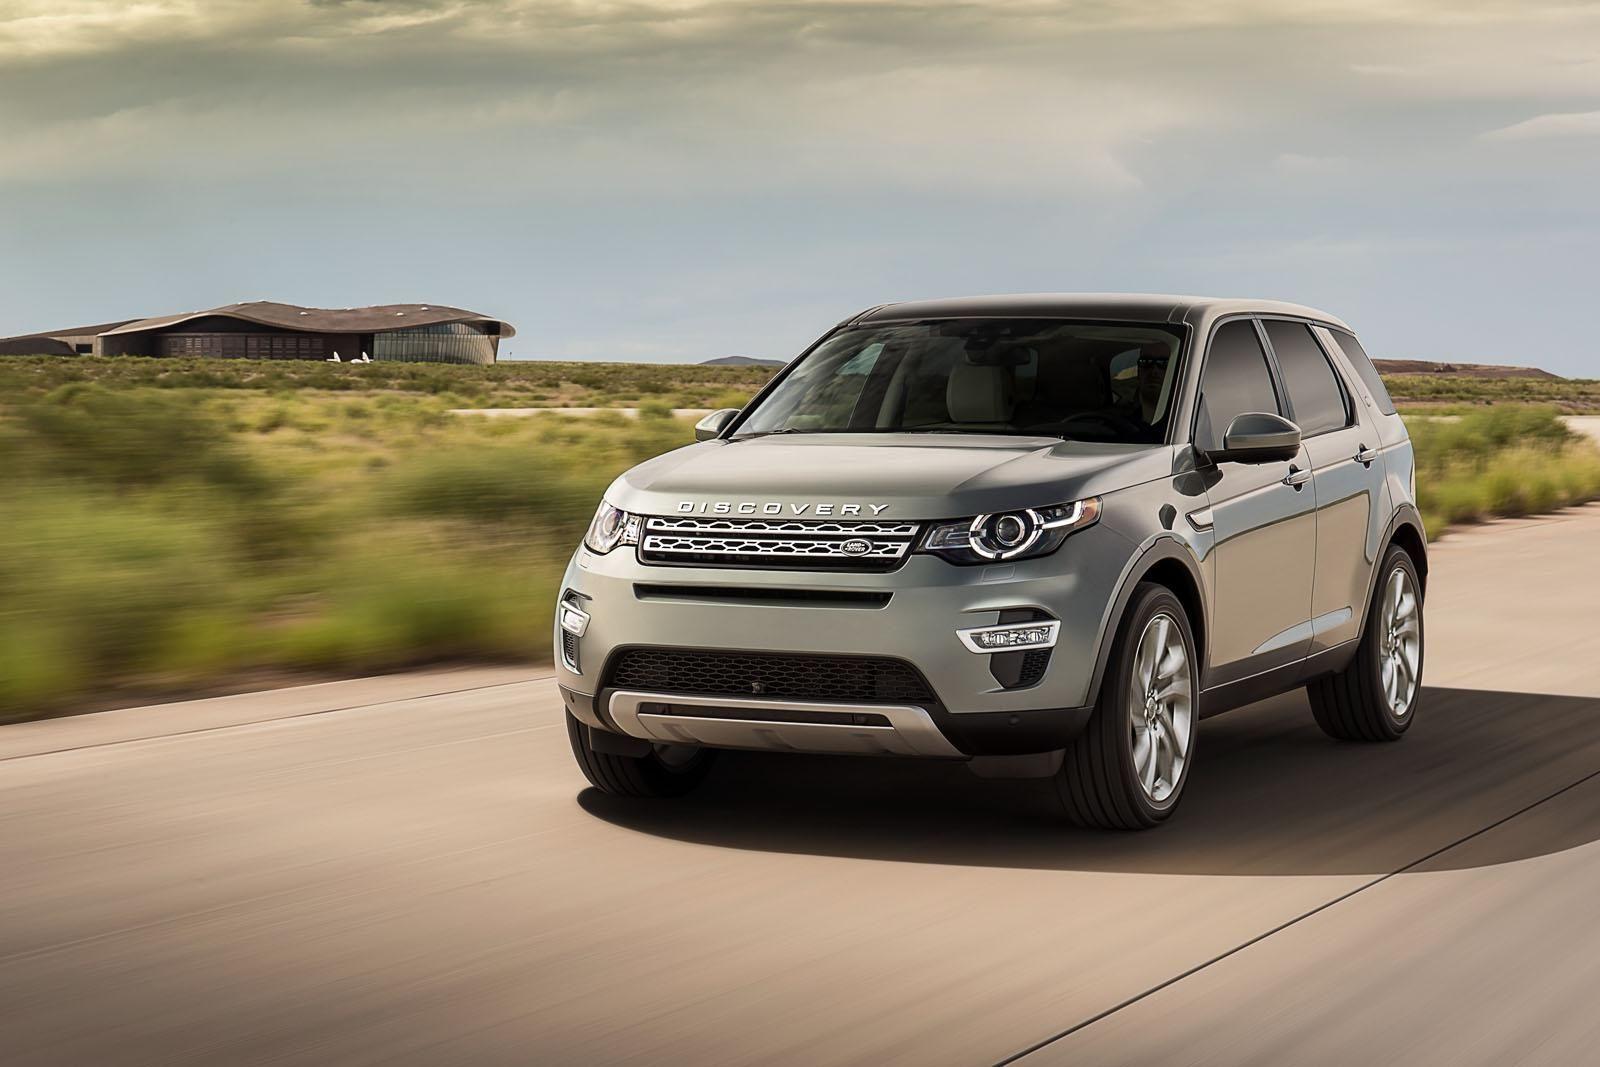 land rover discovery sport 2.0 dizel yakıt tüketimi